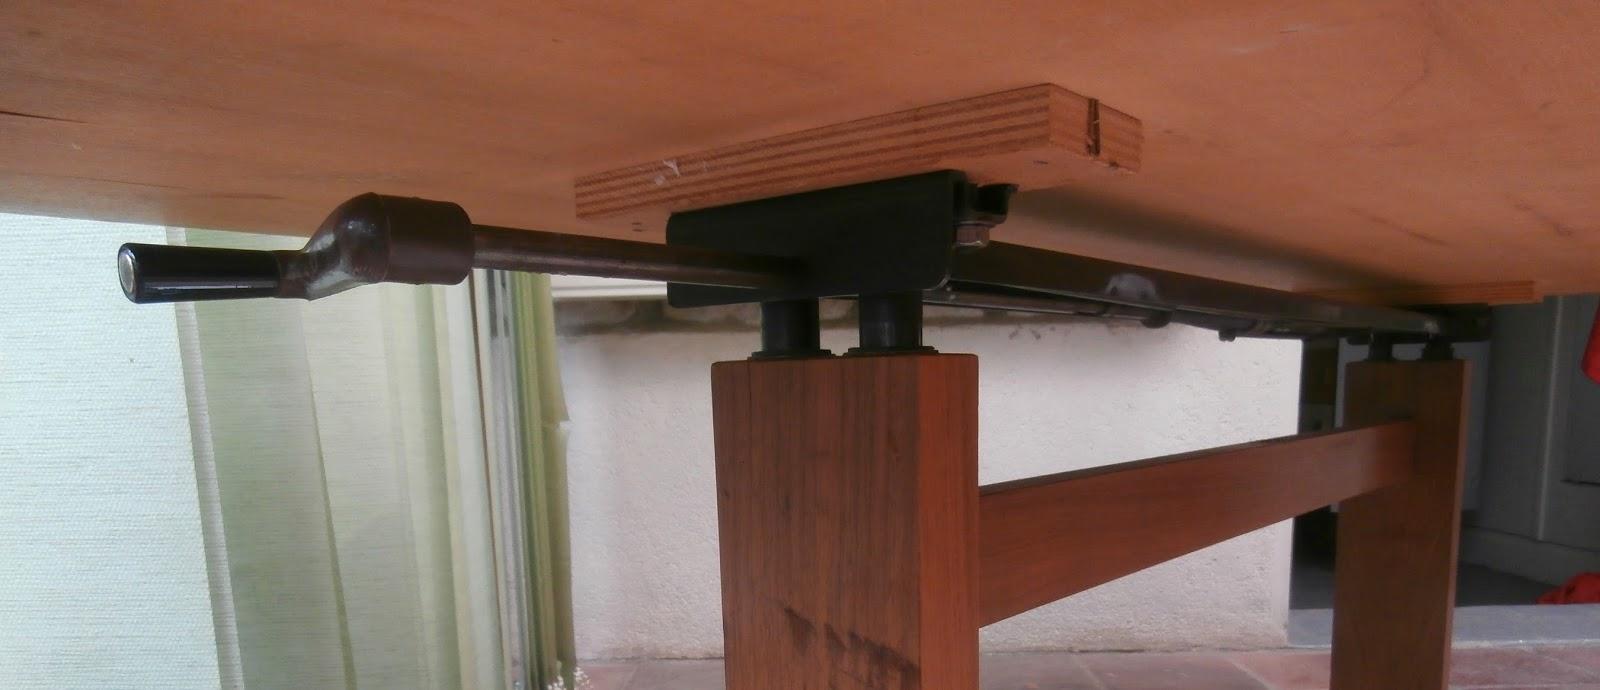 Dur e de vie ind termin e table basse rehaussable - Table basse rehaussable ...